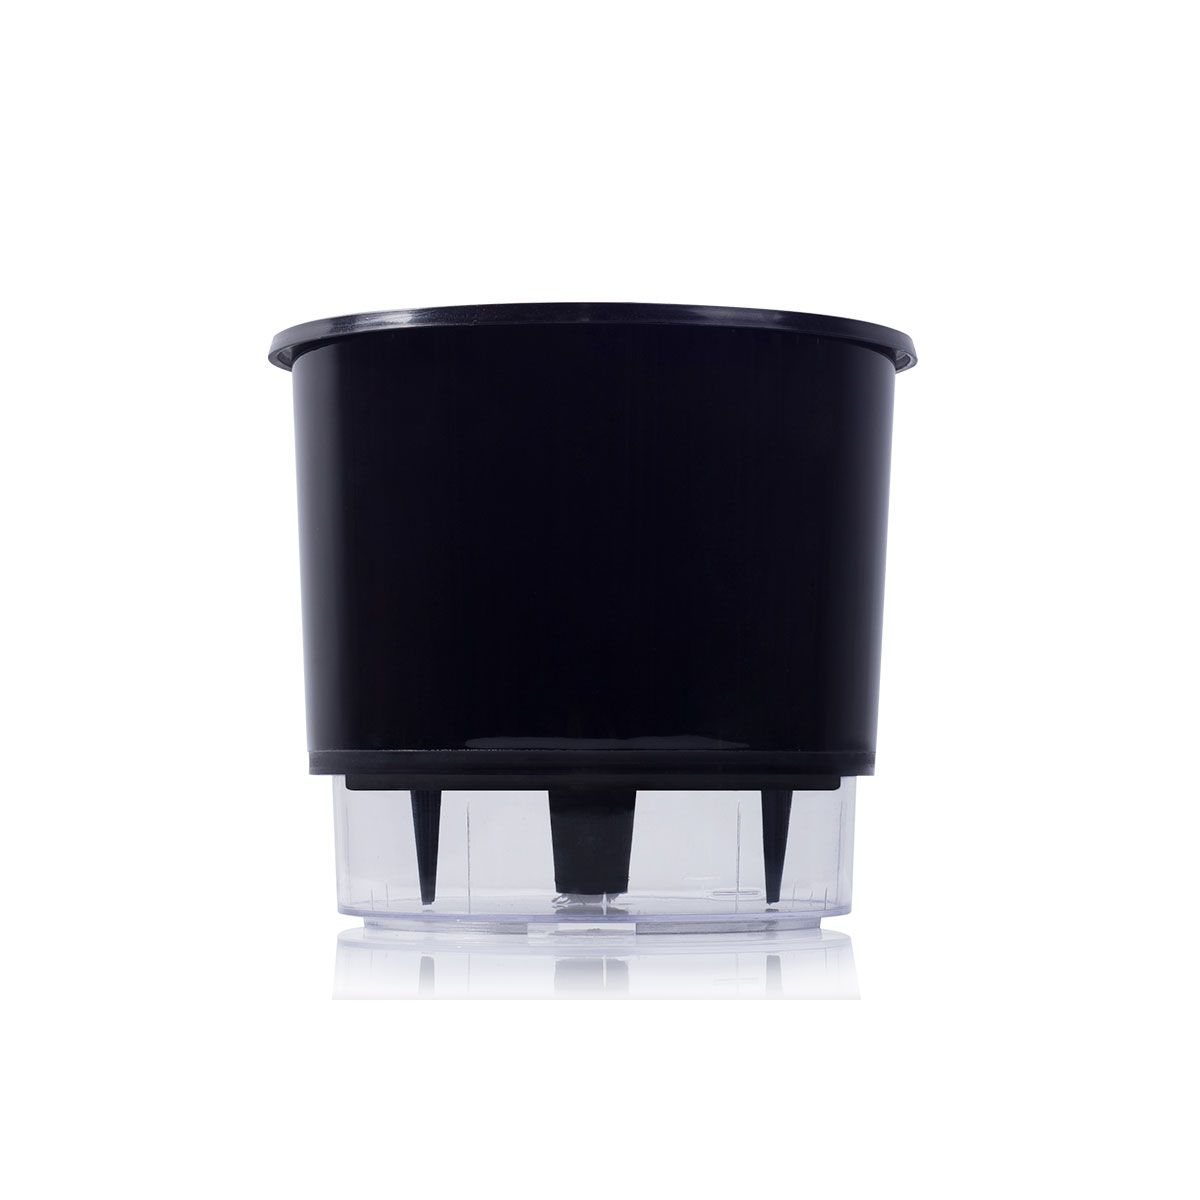 Vaso Autoirrigável Preto Pequeno 12,6 cm x 11,4 cm N02  - Vasos Raiz Loja Oficial